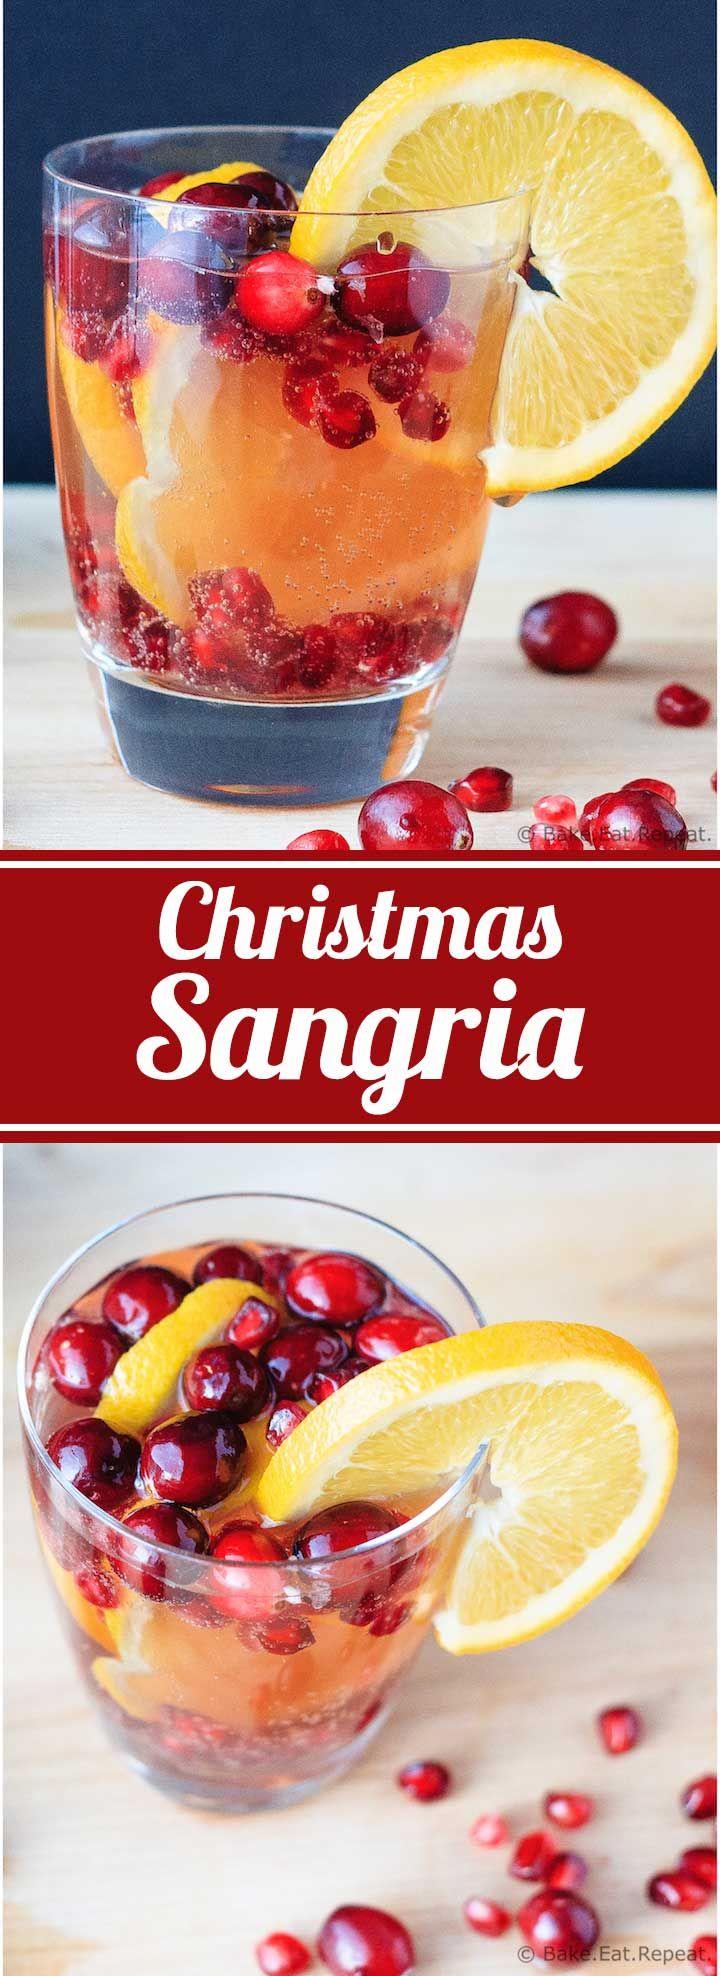 Christmas Sangria Recipe Christmas Sangria Recipes Christmas Sangria Sangria Recipes